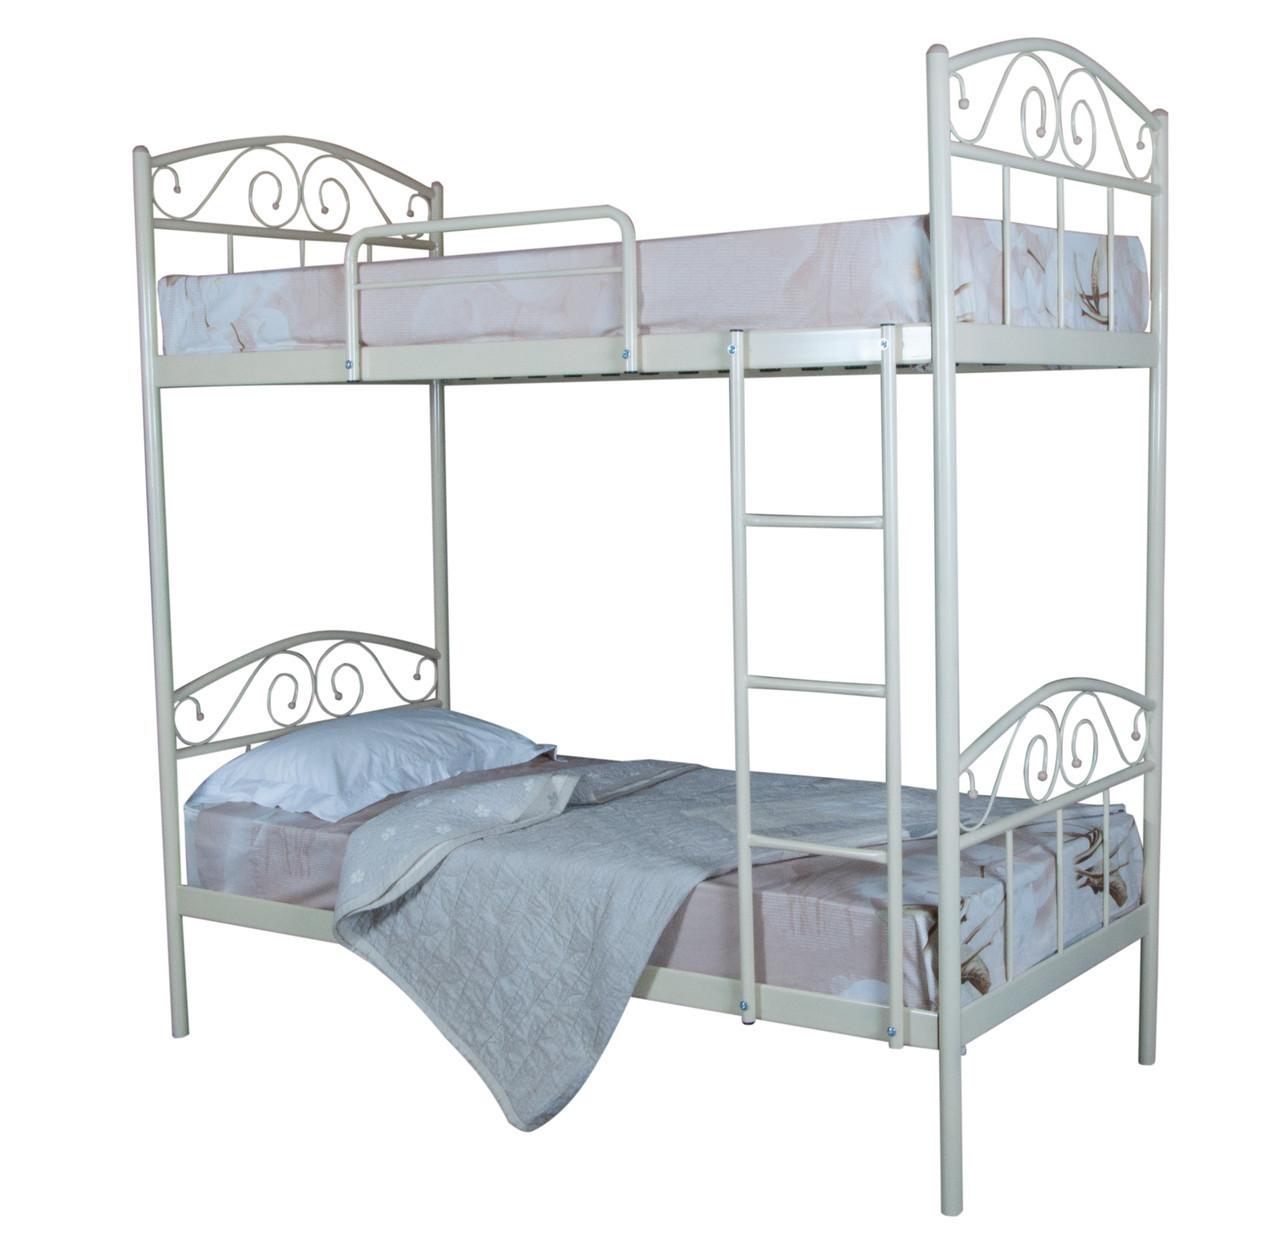 Кровать Элис Люкс двухъярусная 190х90, бежевая